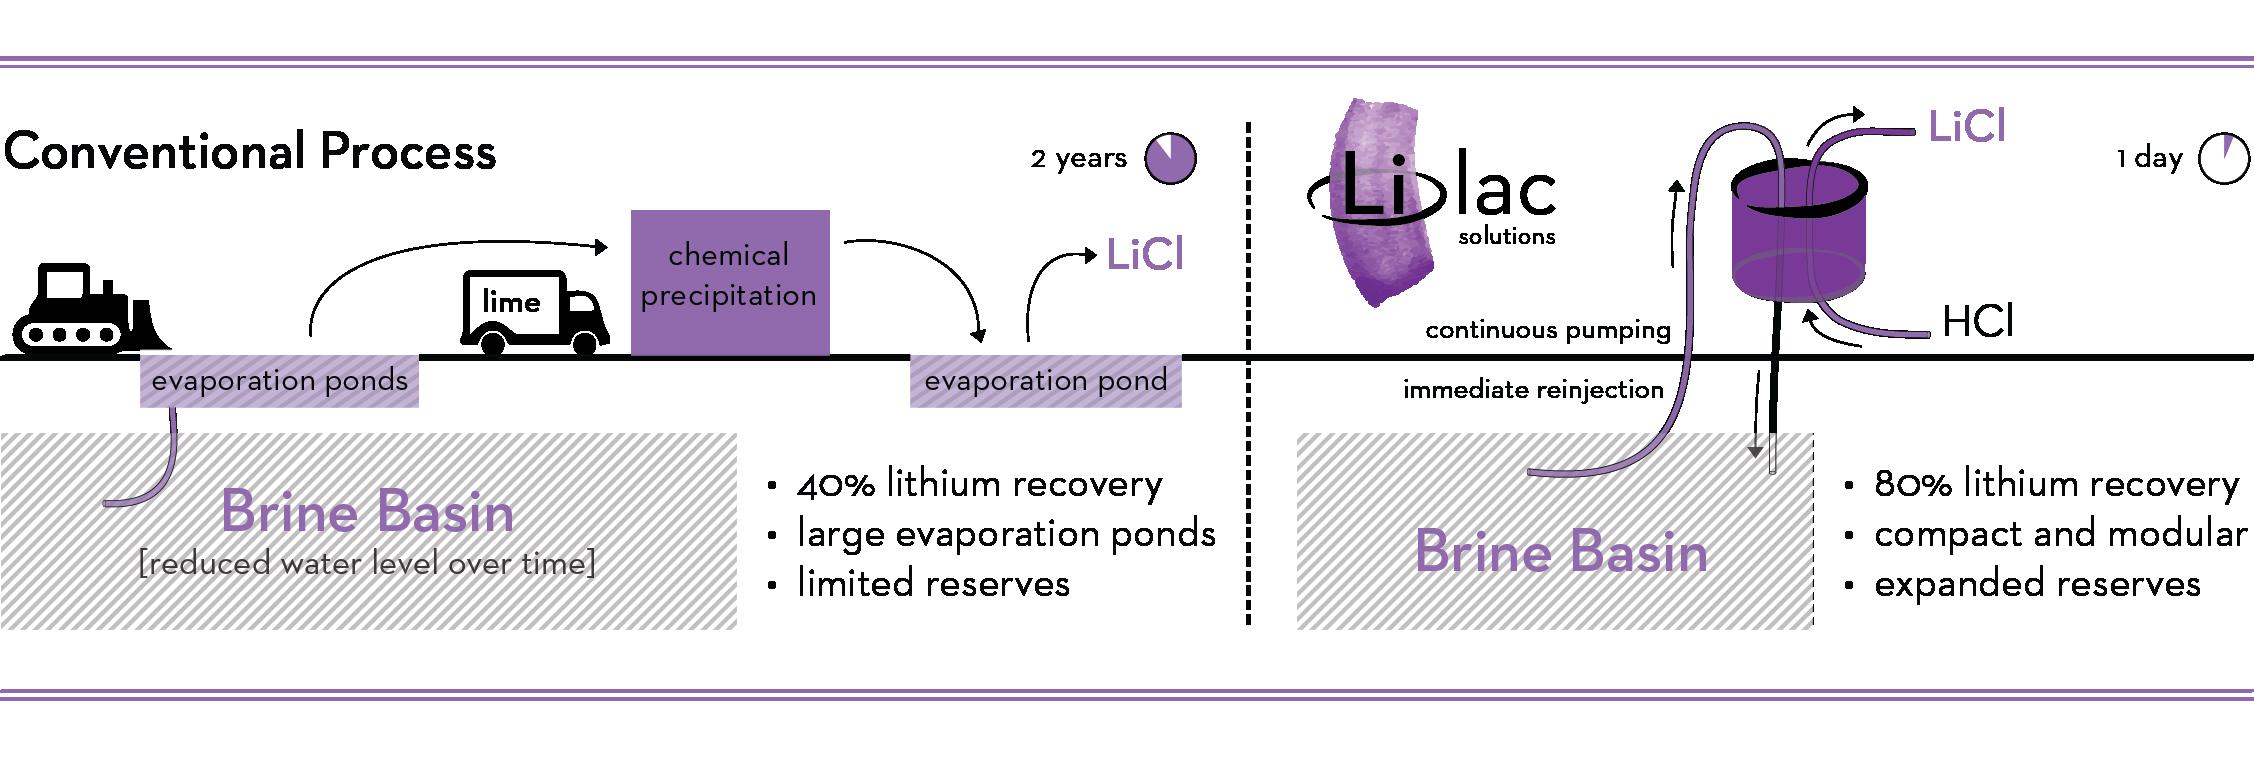 Lilac Solutions - Process Comparison Diagram_v2_transparent.png